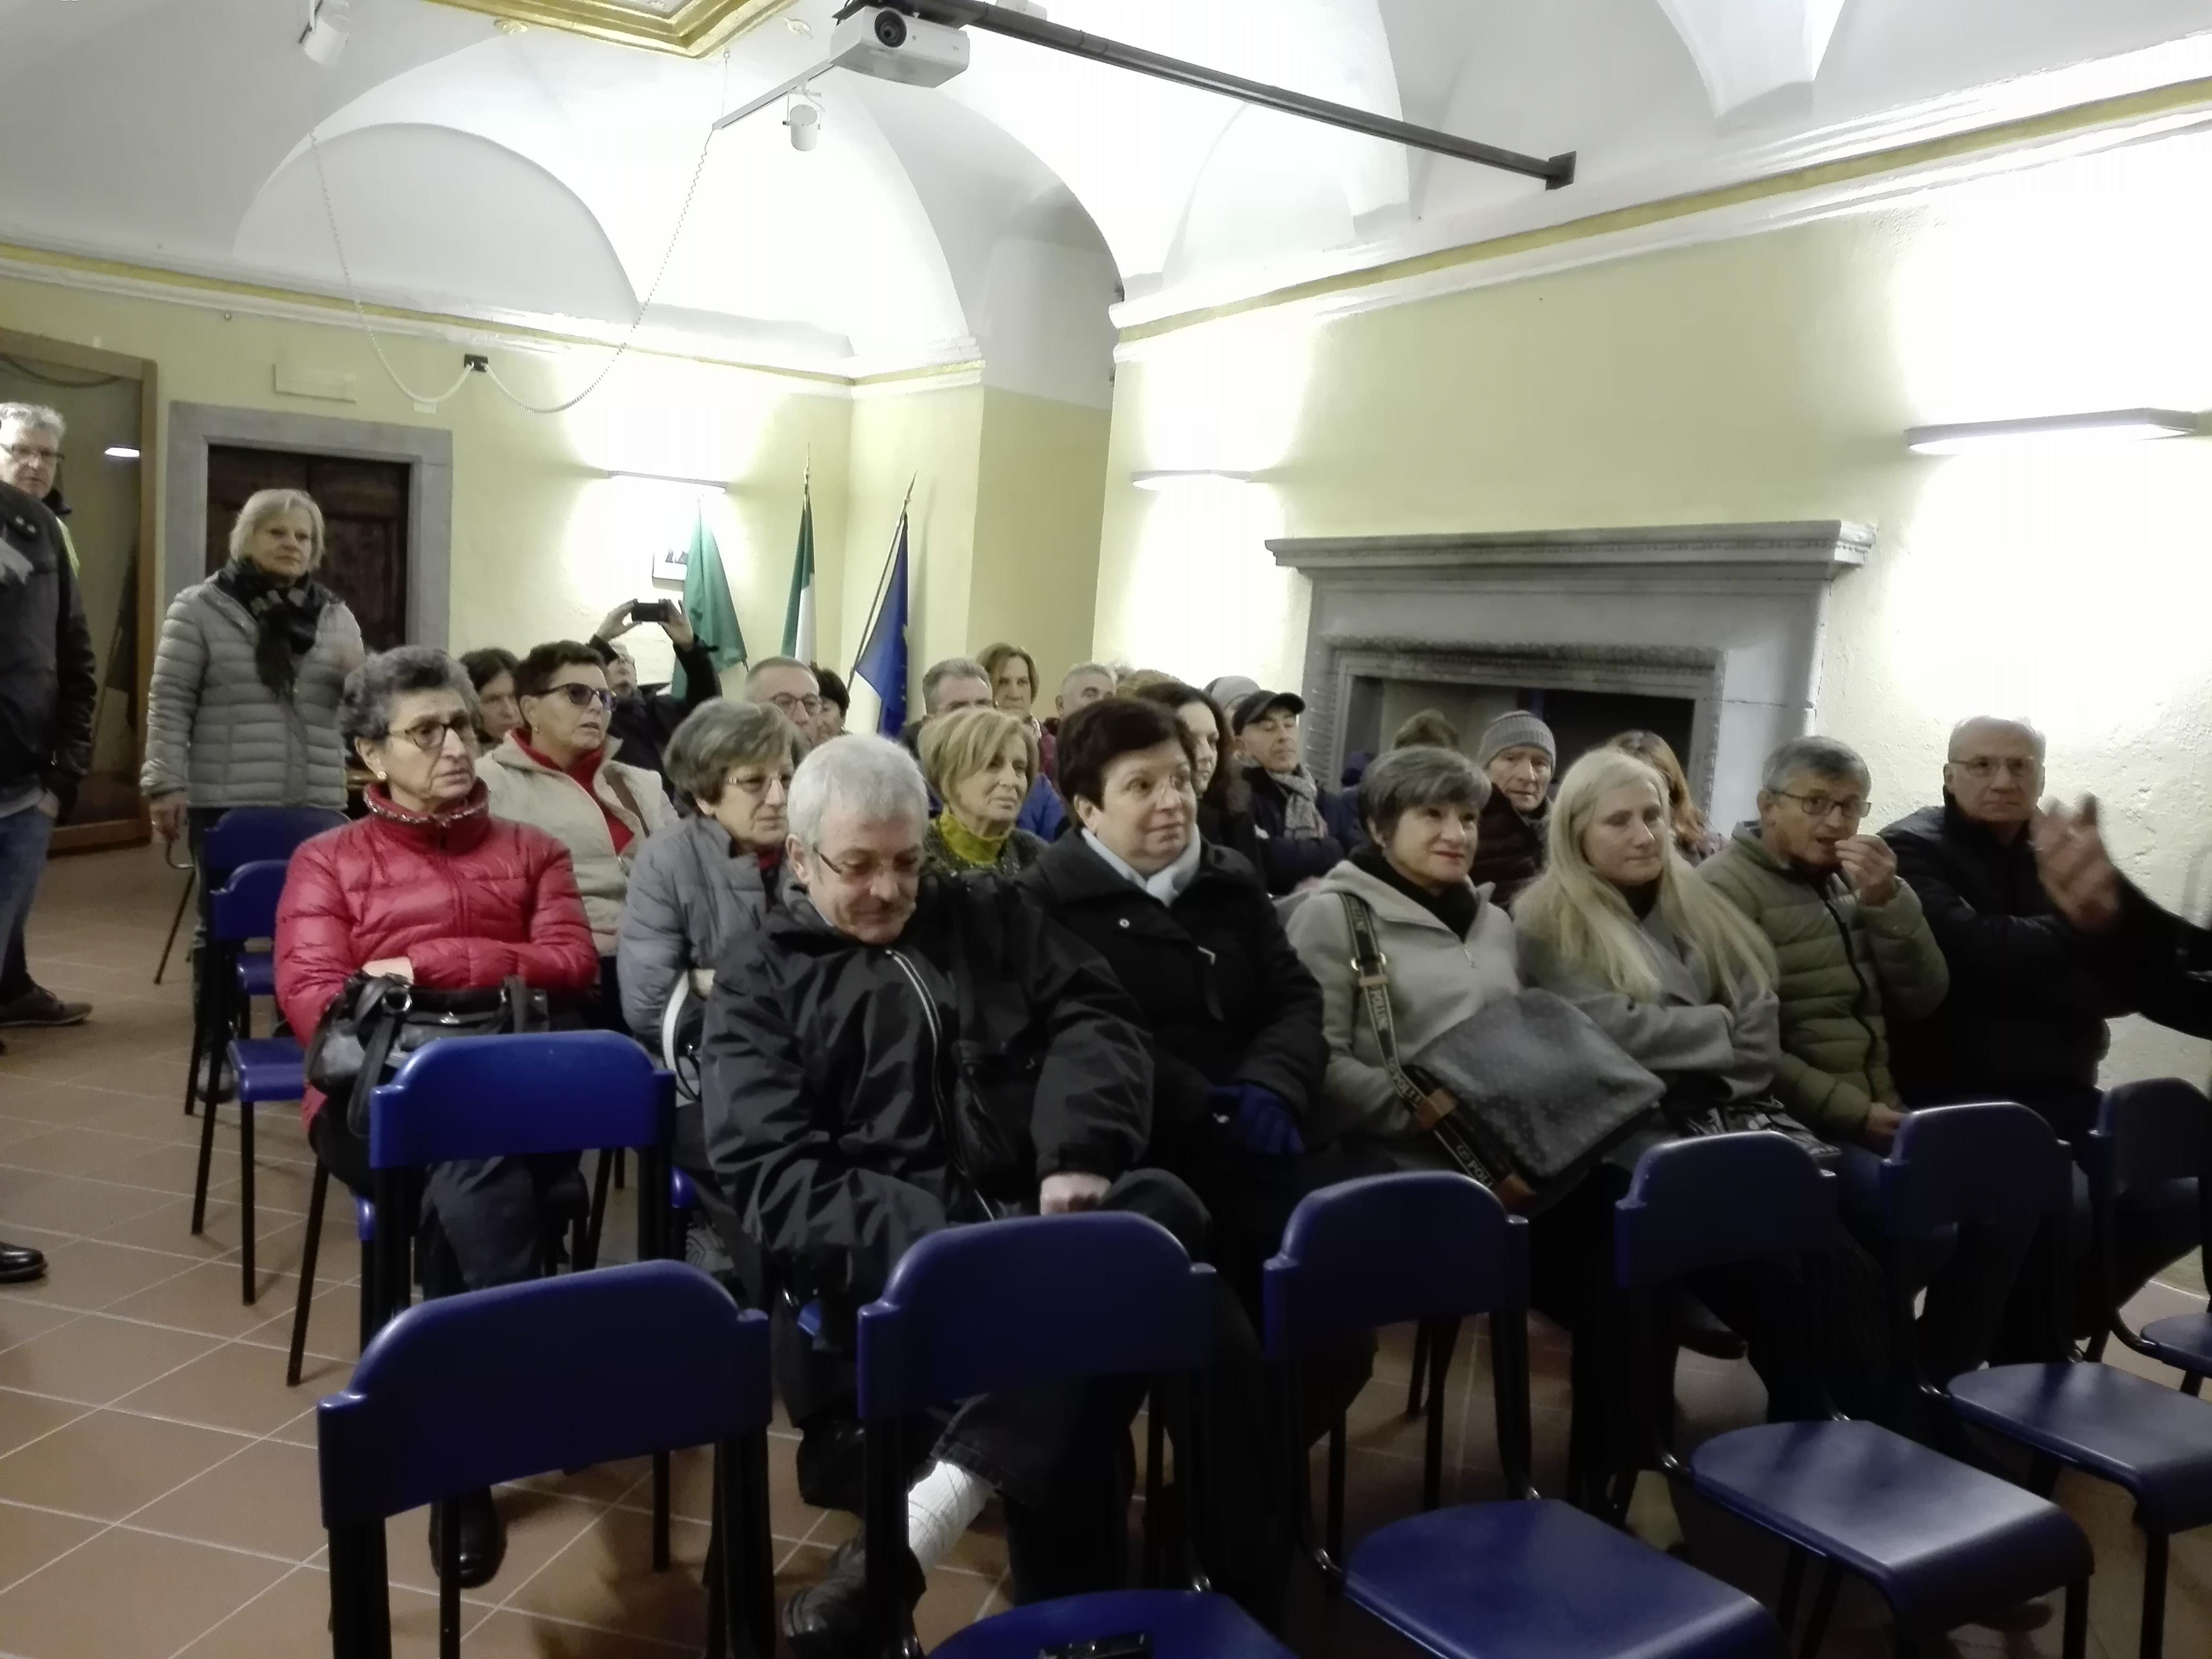 03_gita Val Cavallina 12 novembre 2017